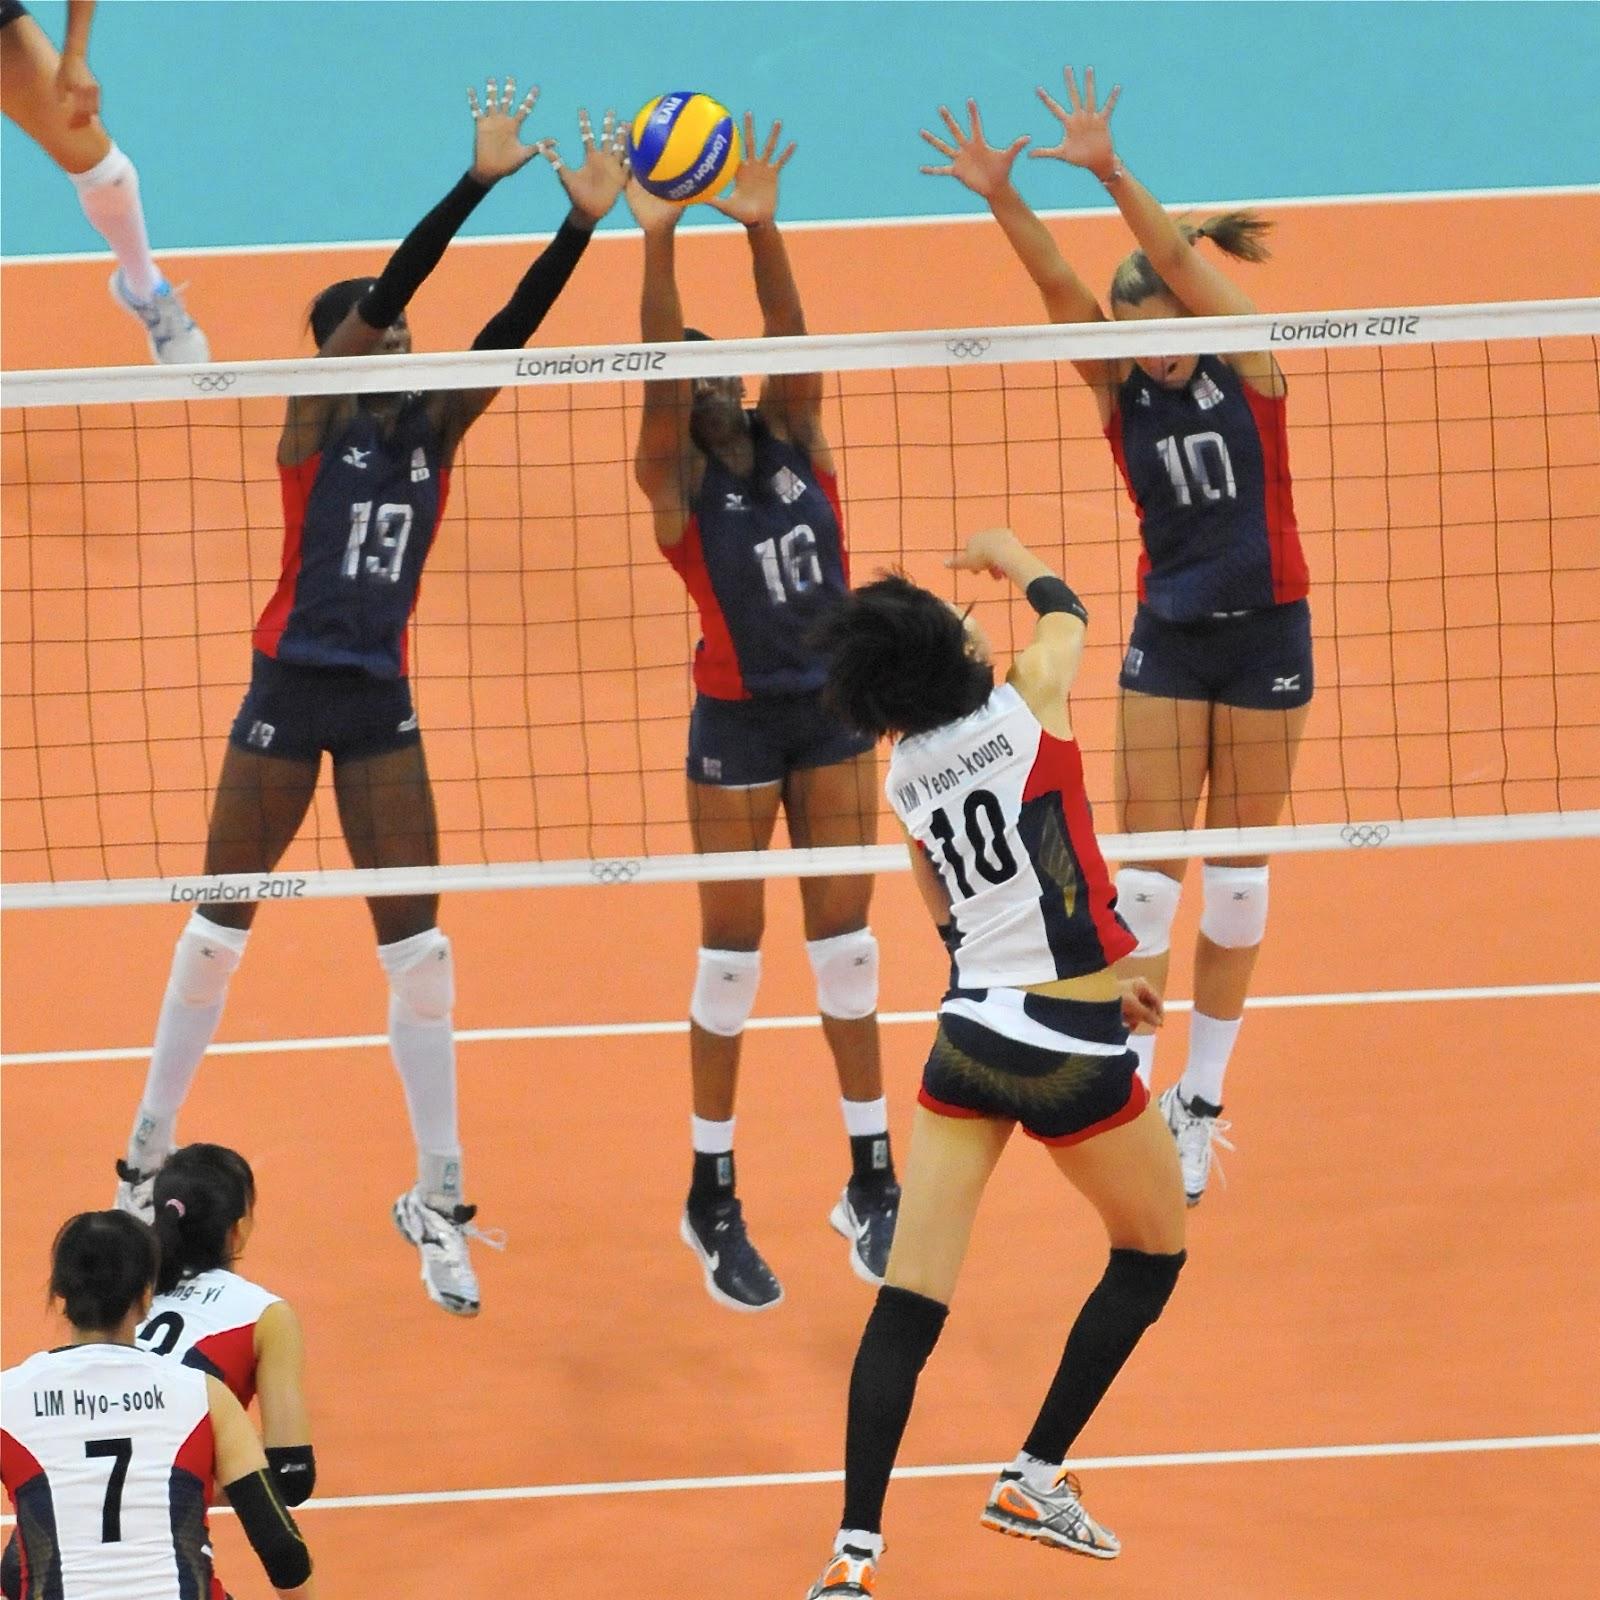 London 2012 Olympic Photo Blog: USA Women's Volleyball Team